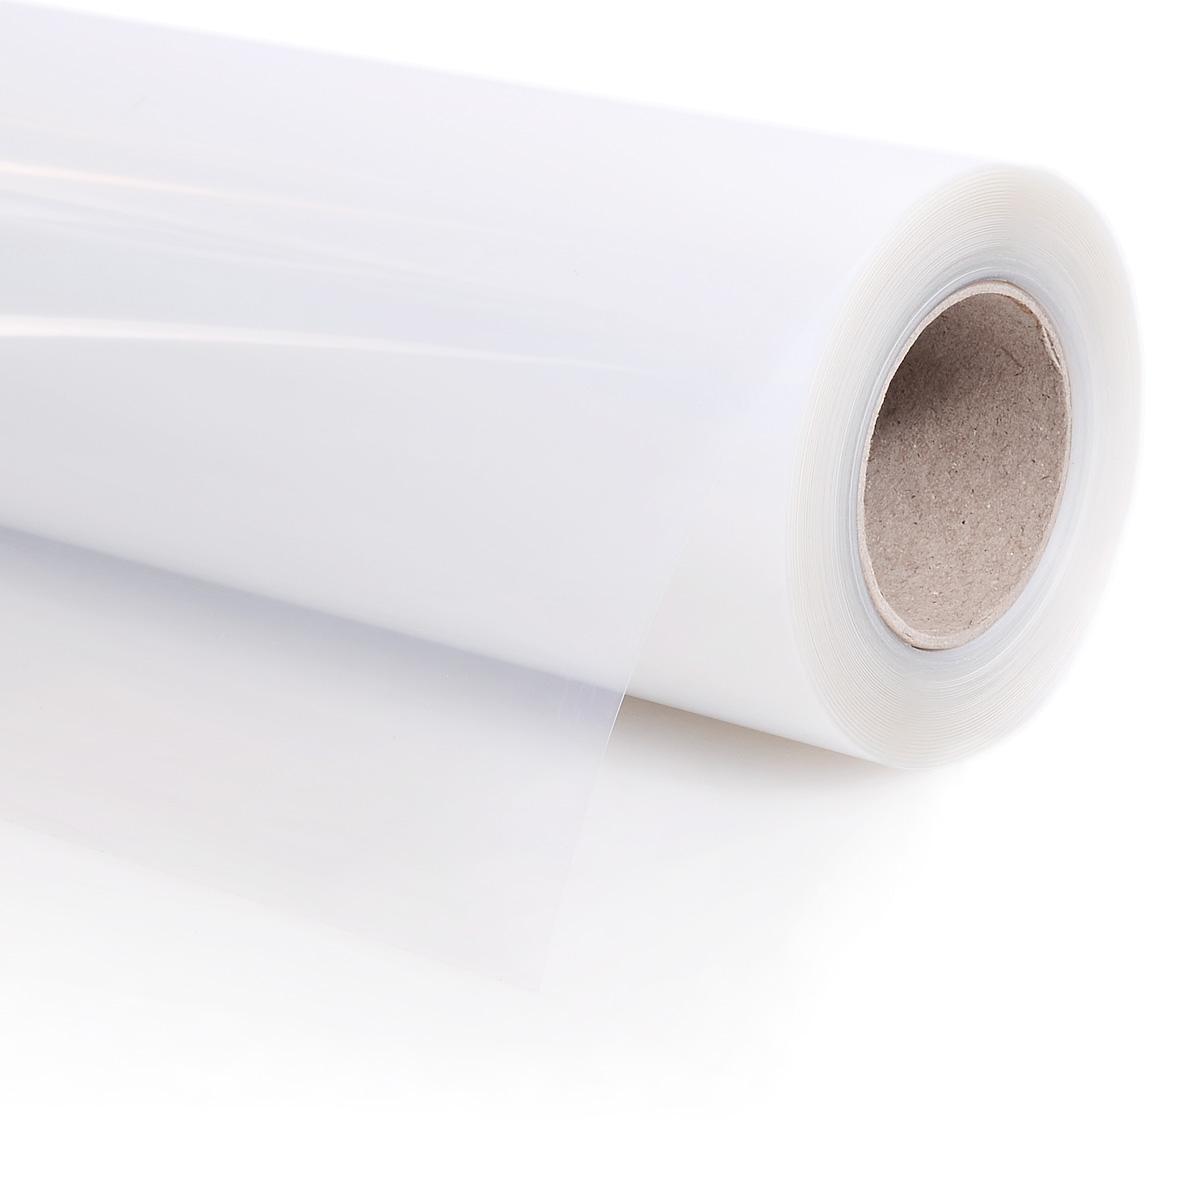 1 Rolle digitaler Siebdruckfilm | Inkjetfilm | 111,8 cm x 30 m | PET Film